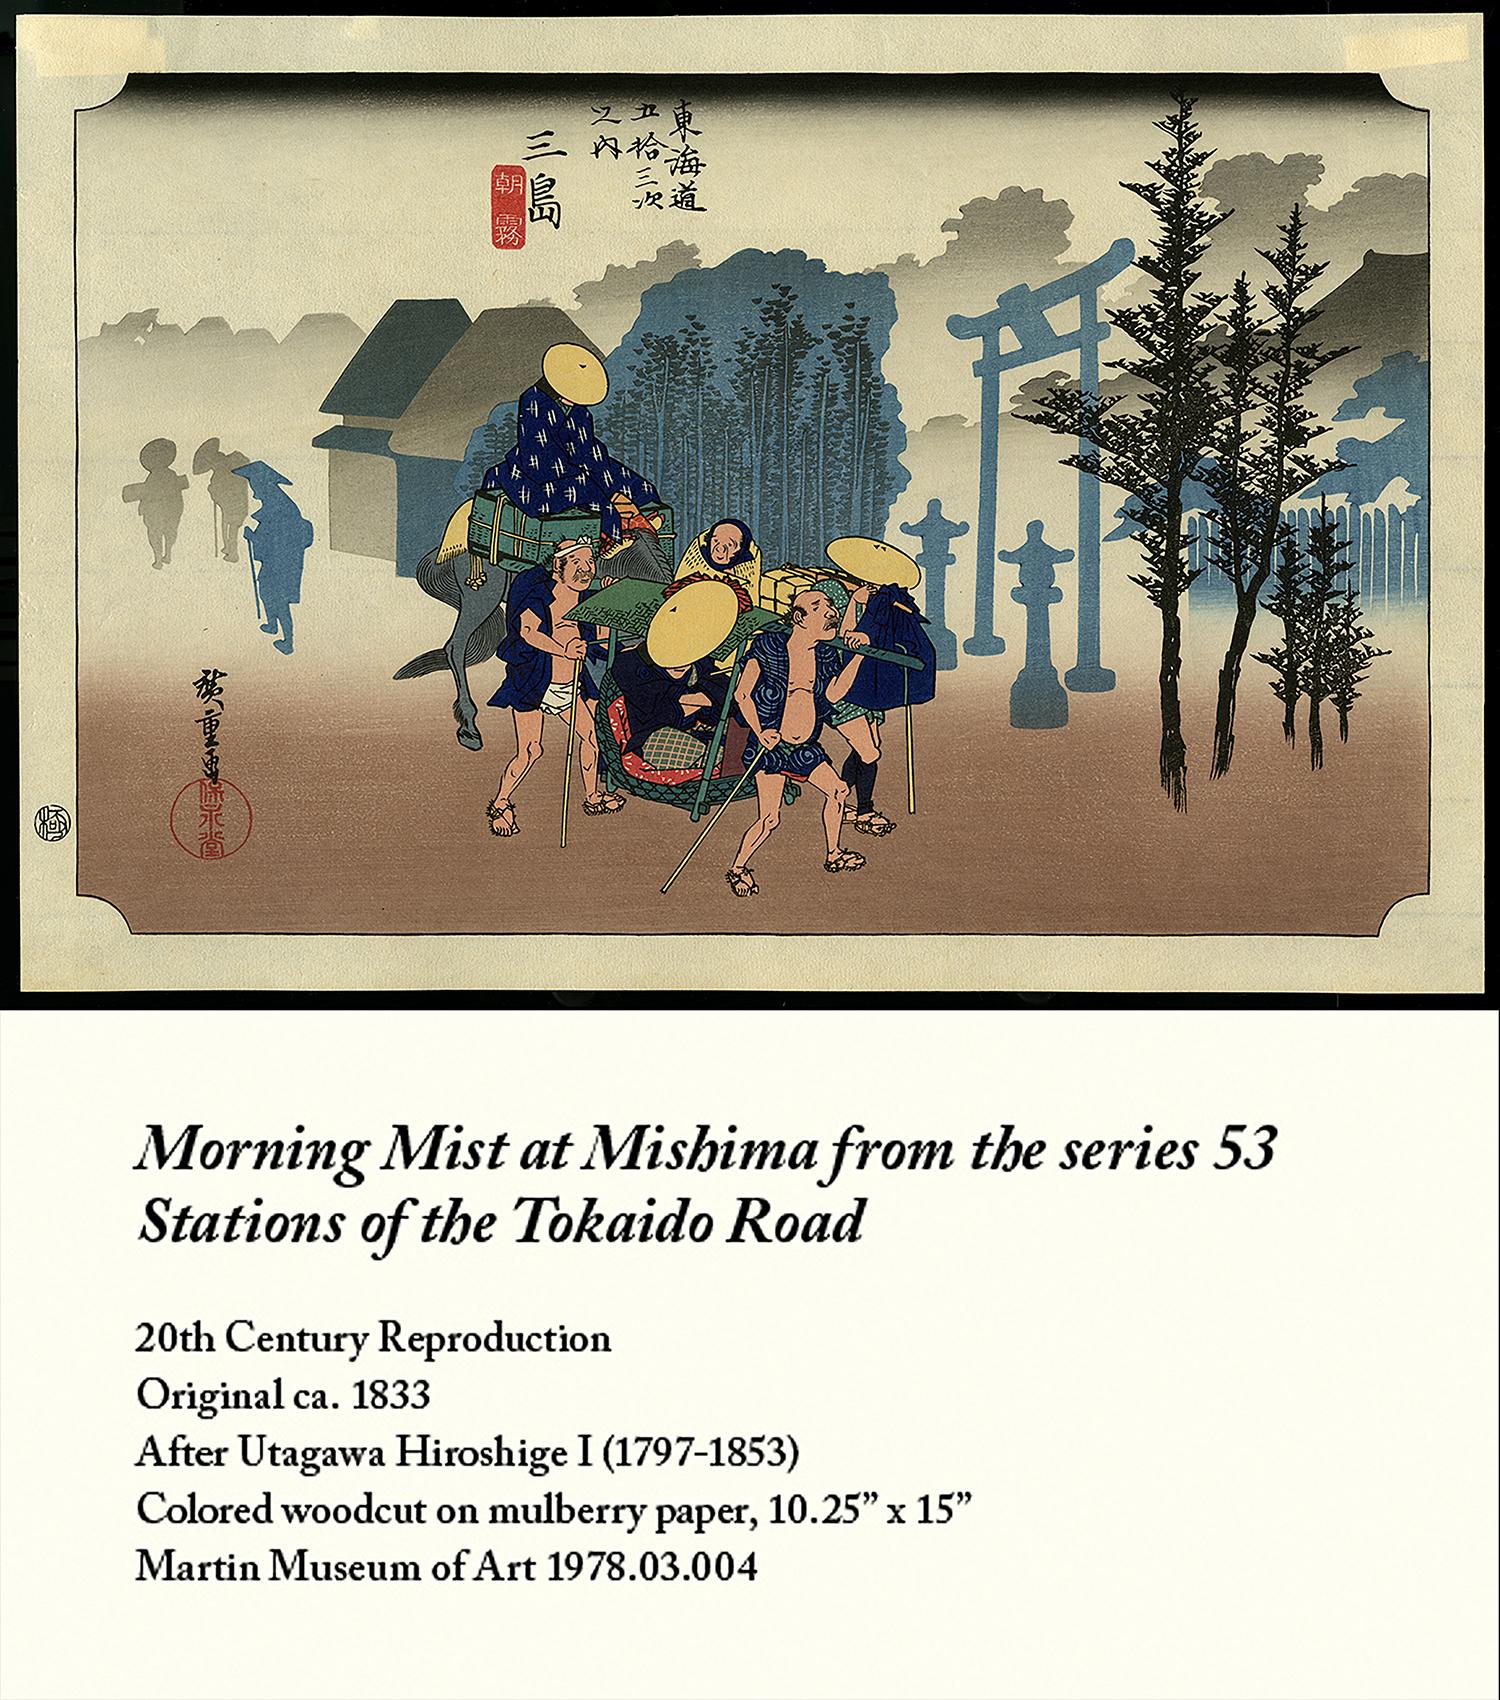 Morning Mist at Mishima